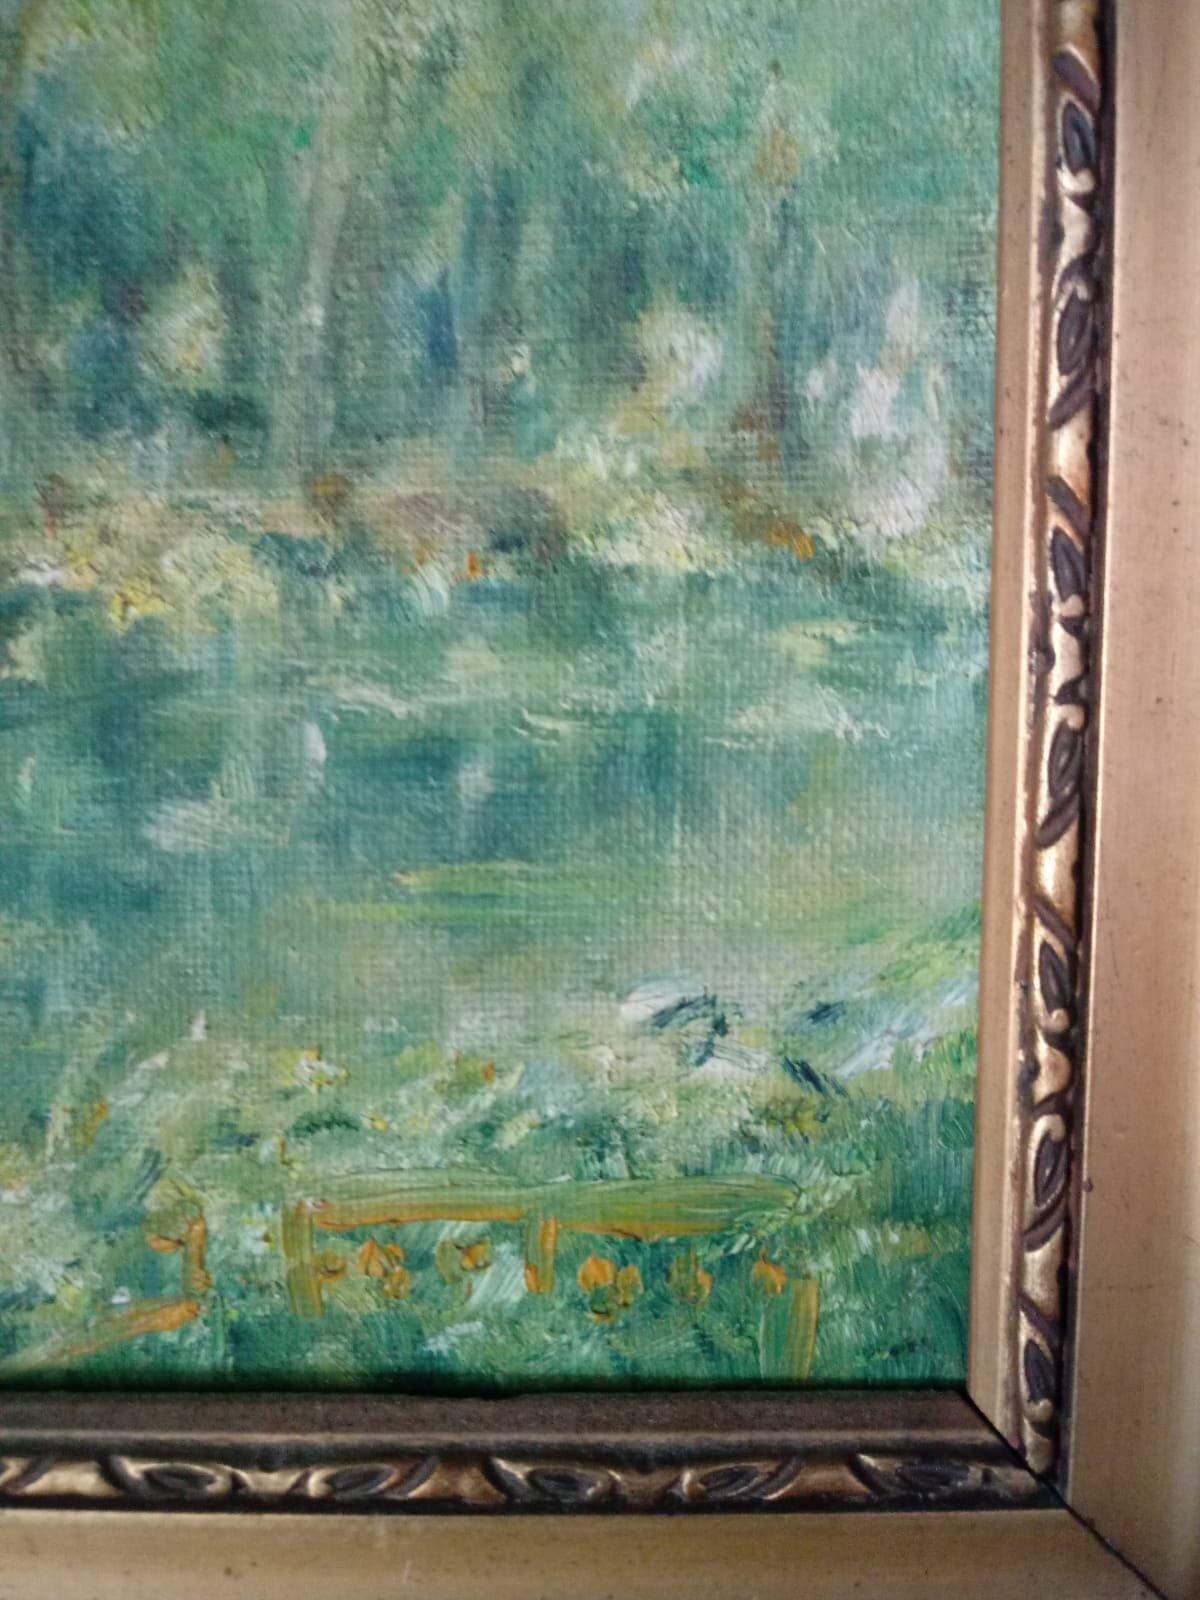 Identifying Signature Oil Painting - Artist Forum